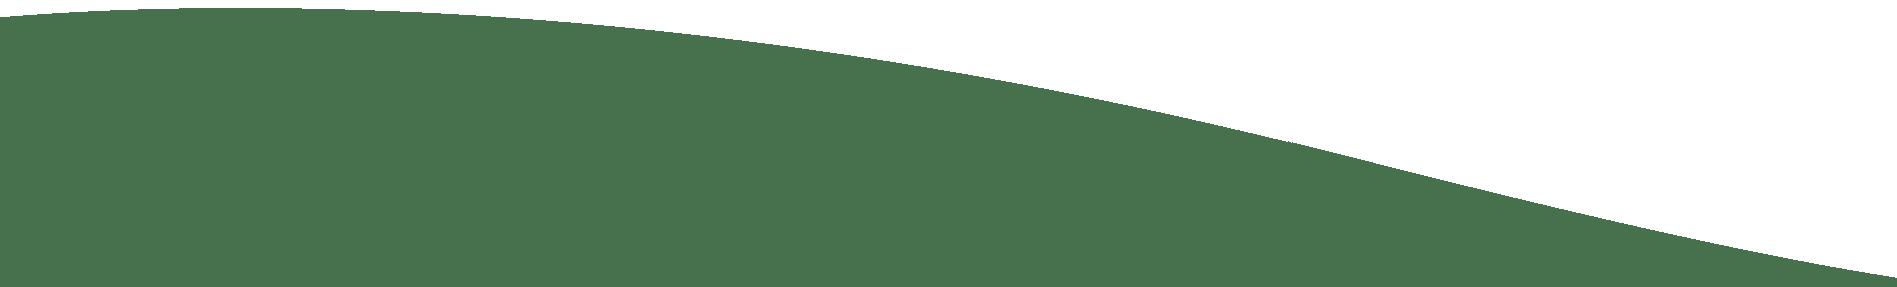 Curve Graphic